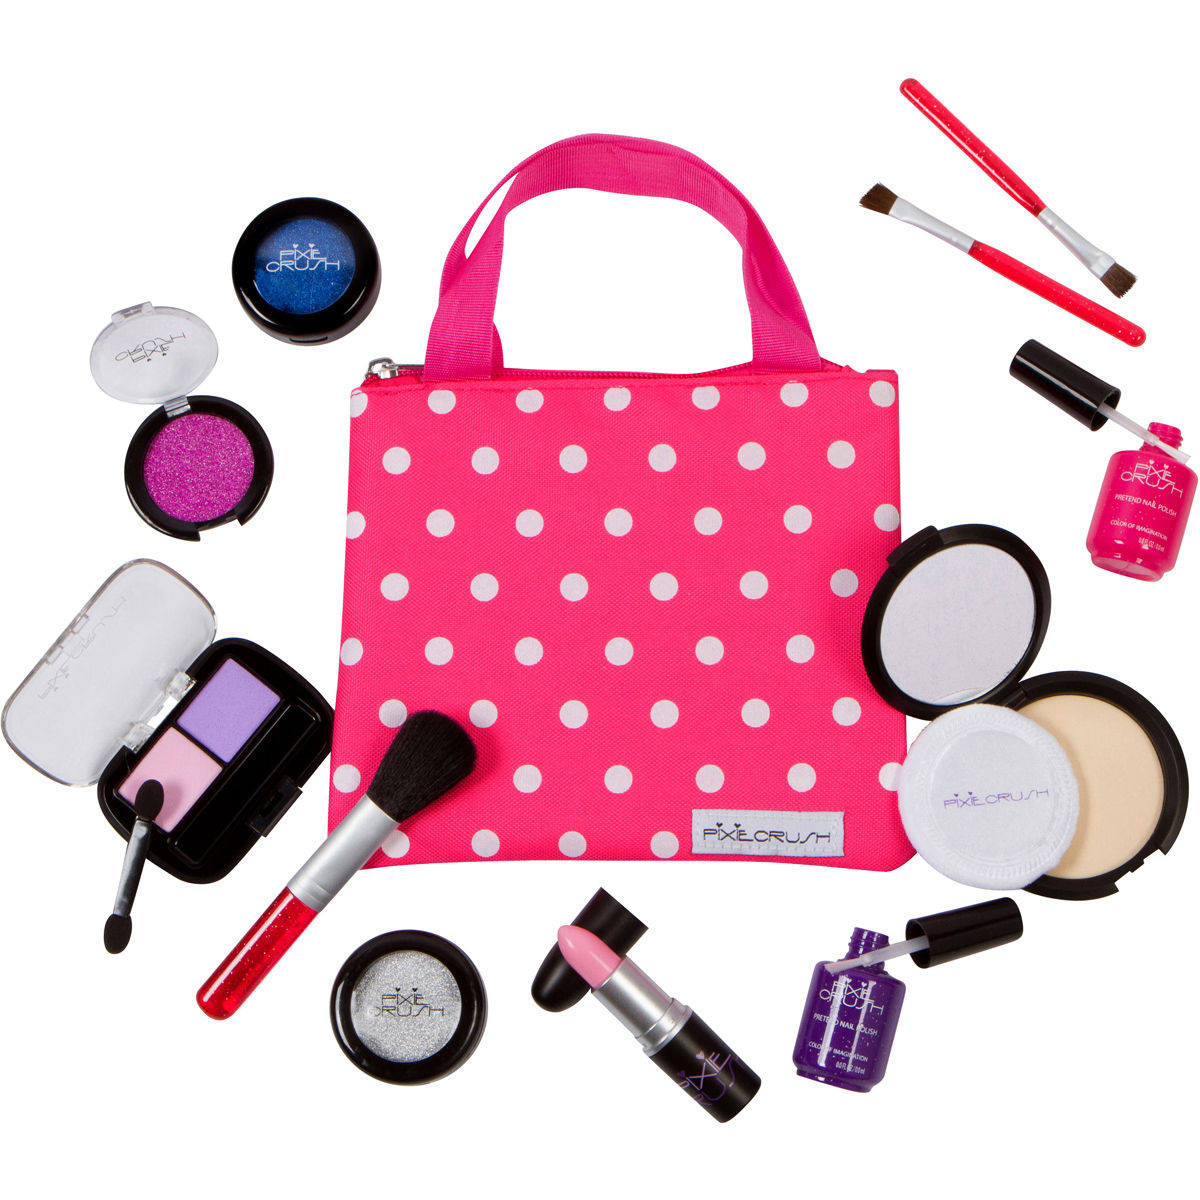 PixieCrush Pretend Play Makeup Kit. Designer Girls Polka Dot Bag - Beauty Basics Set